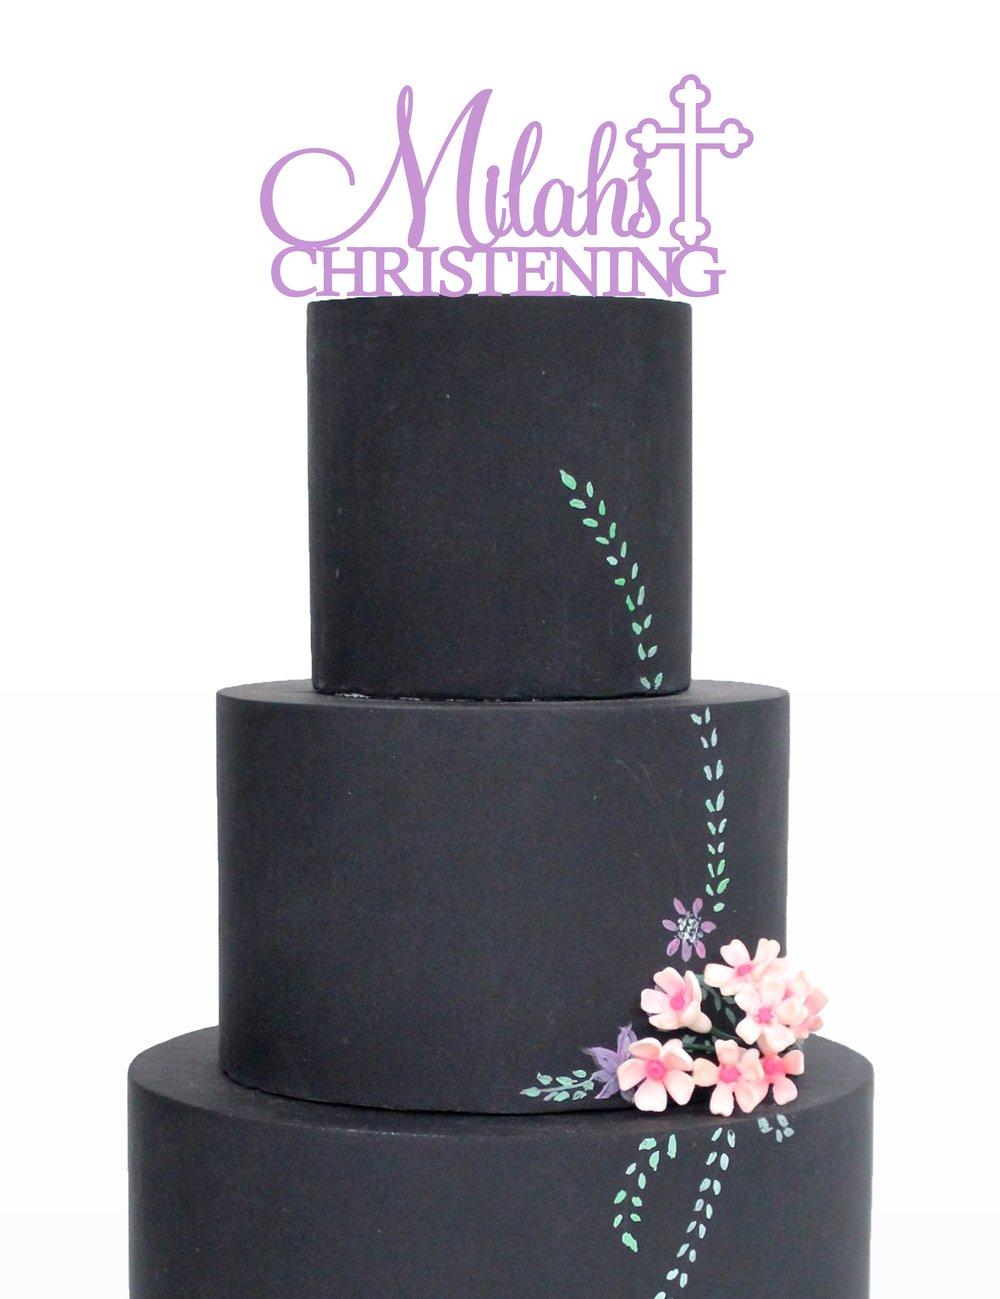 Image of Name Christening/Baptism Cake Topper